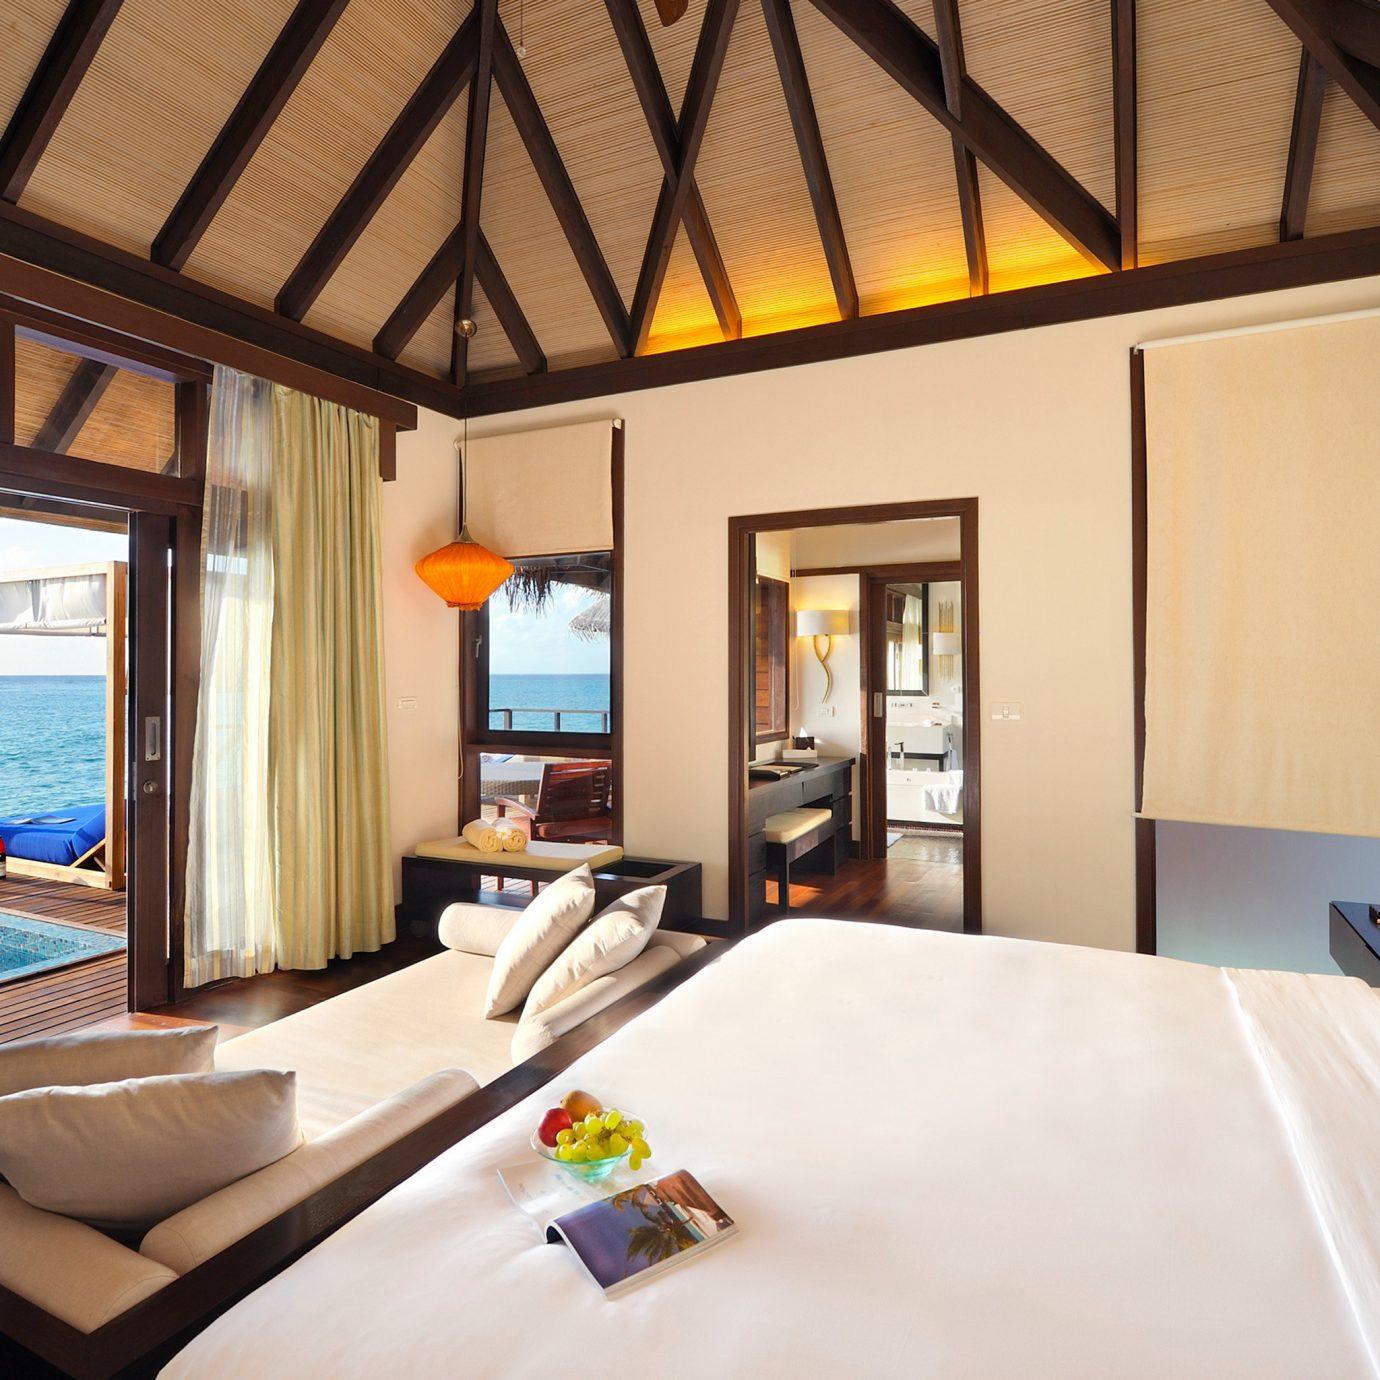 Bedroom Island Luxury Overwater Bungalow Romance Romantic Suite property Resort Villa living room home cottage pillow condominium